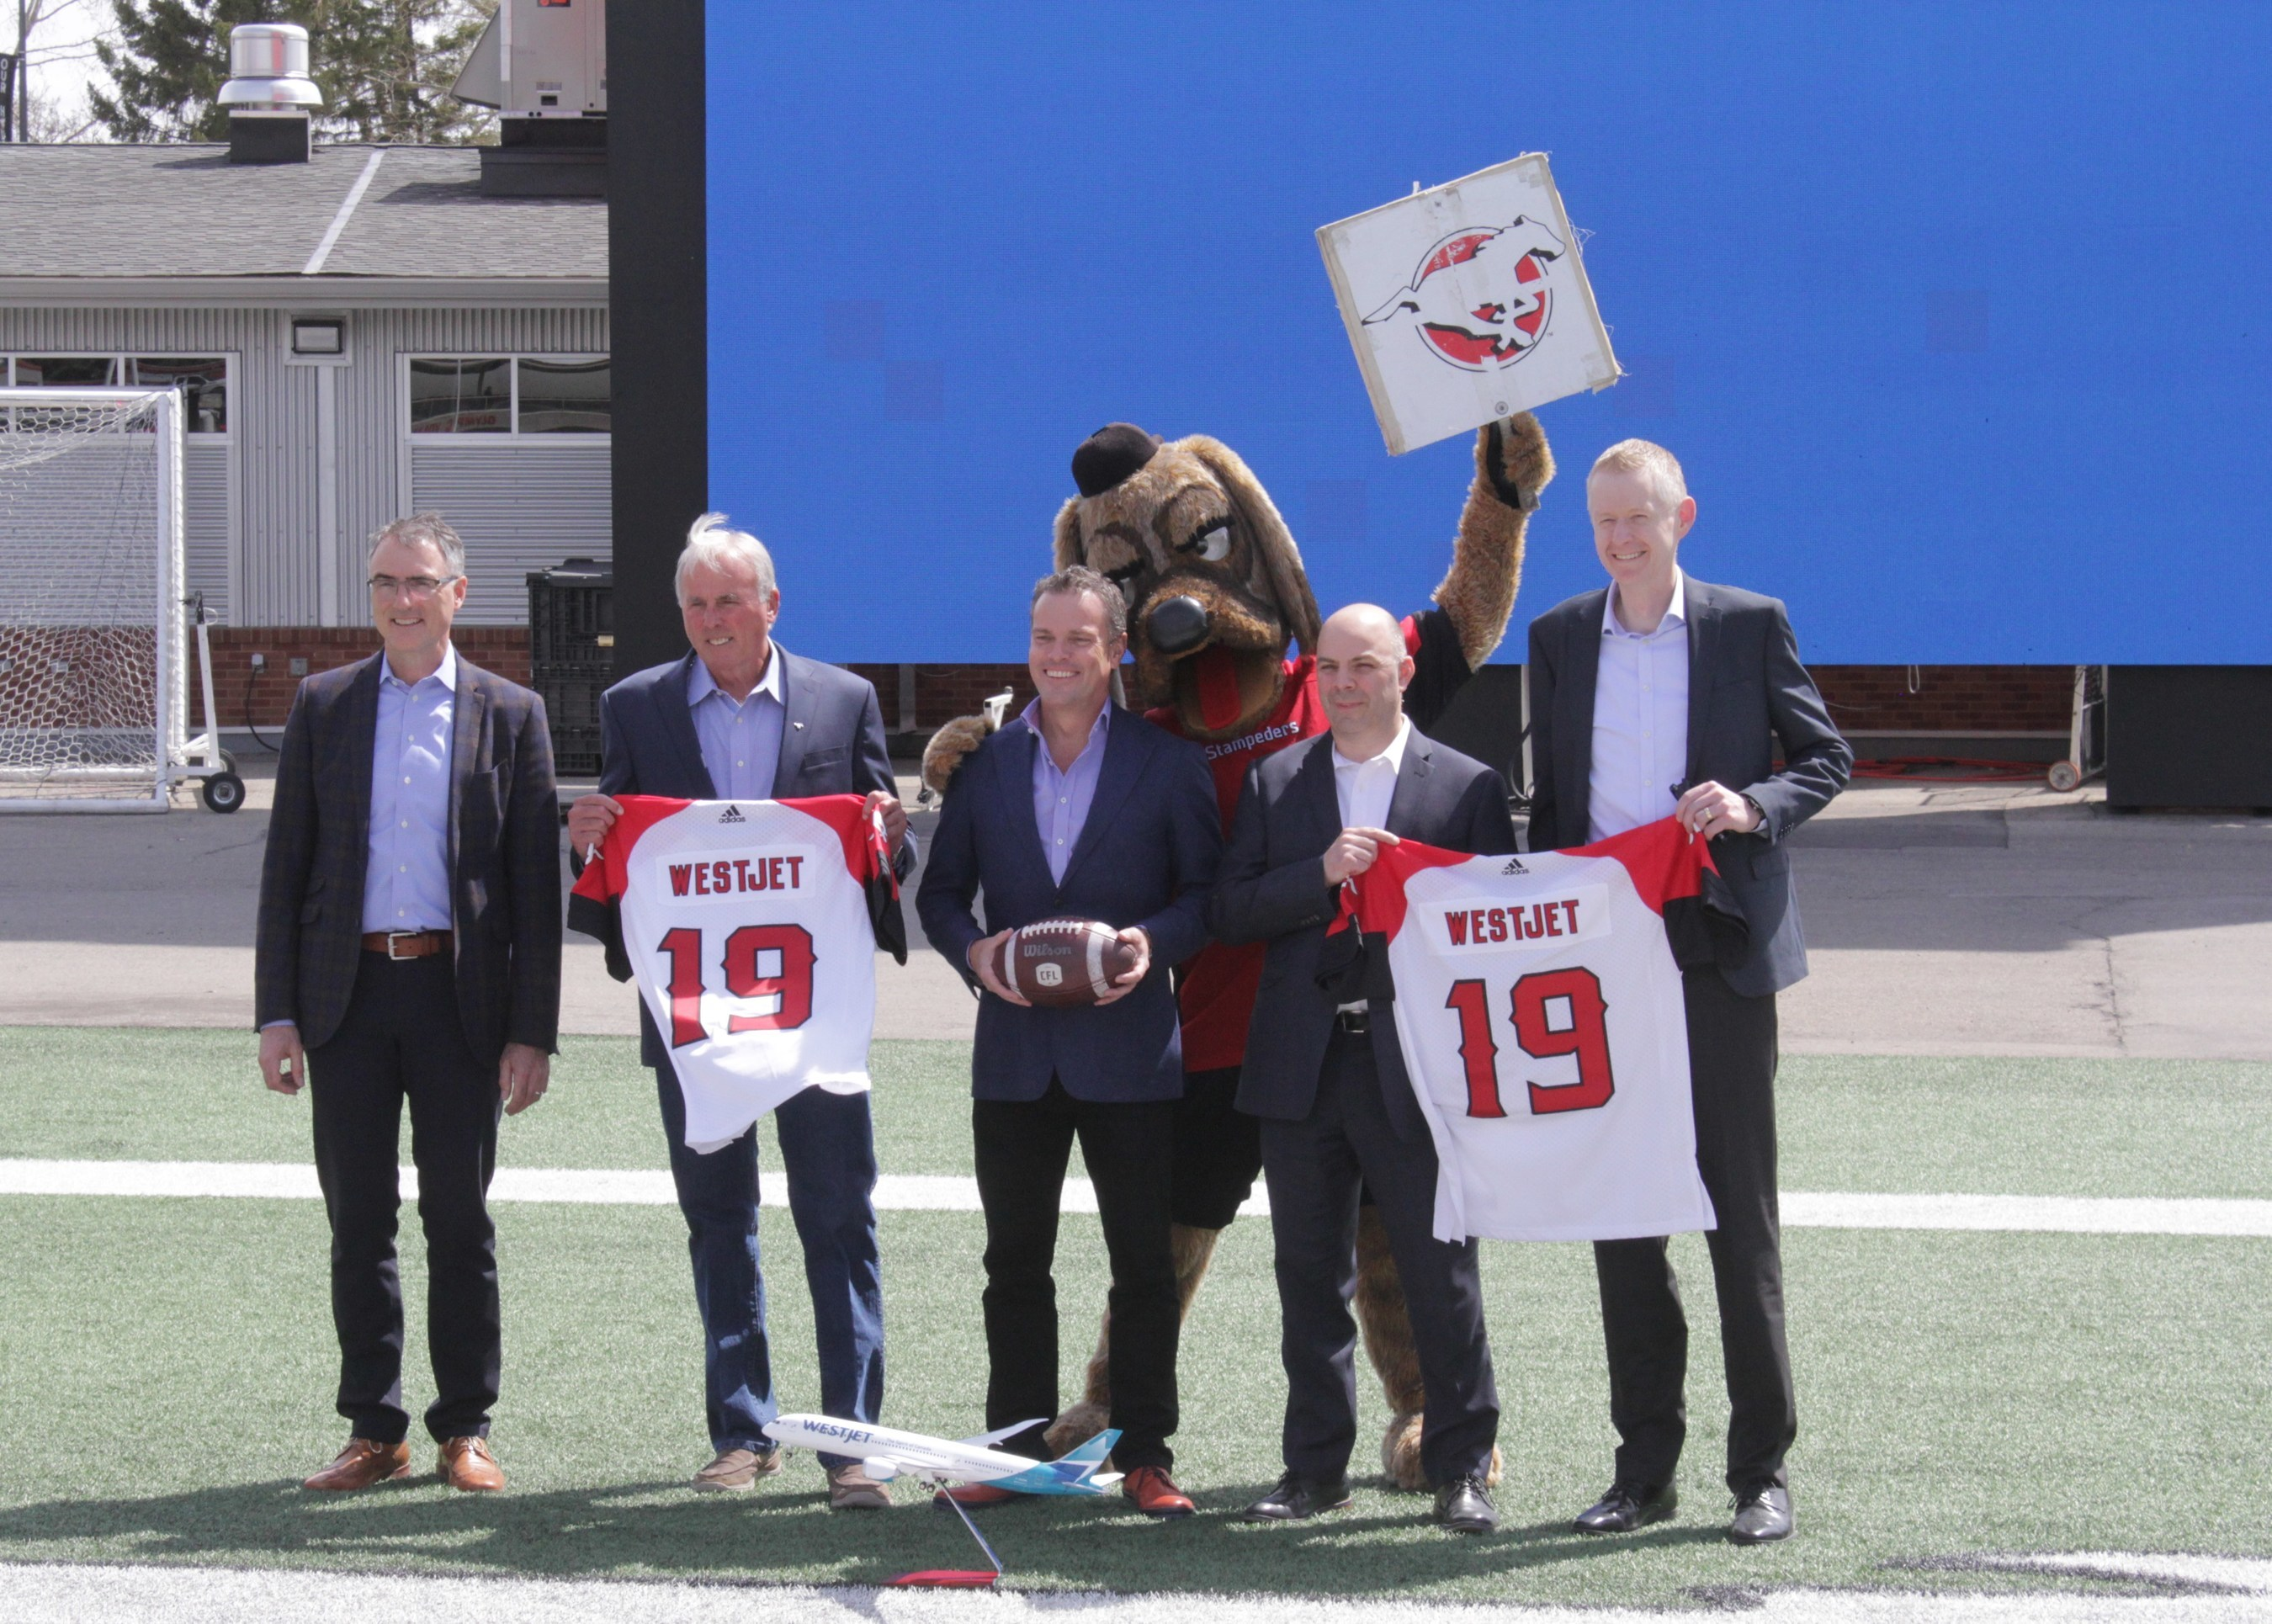 WestJet and Calgary Stampeders at McMahon Stadium (CNW Group/WESTJET, an Alberta Partnership)